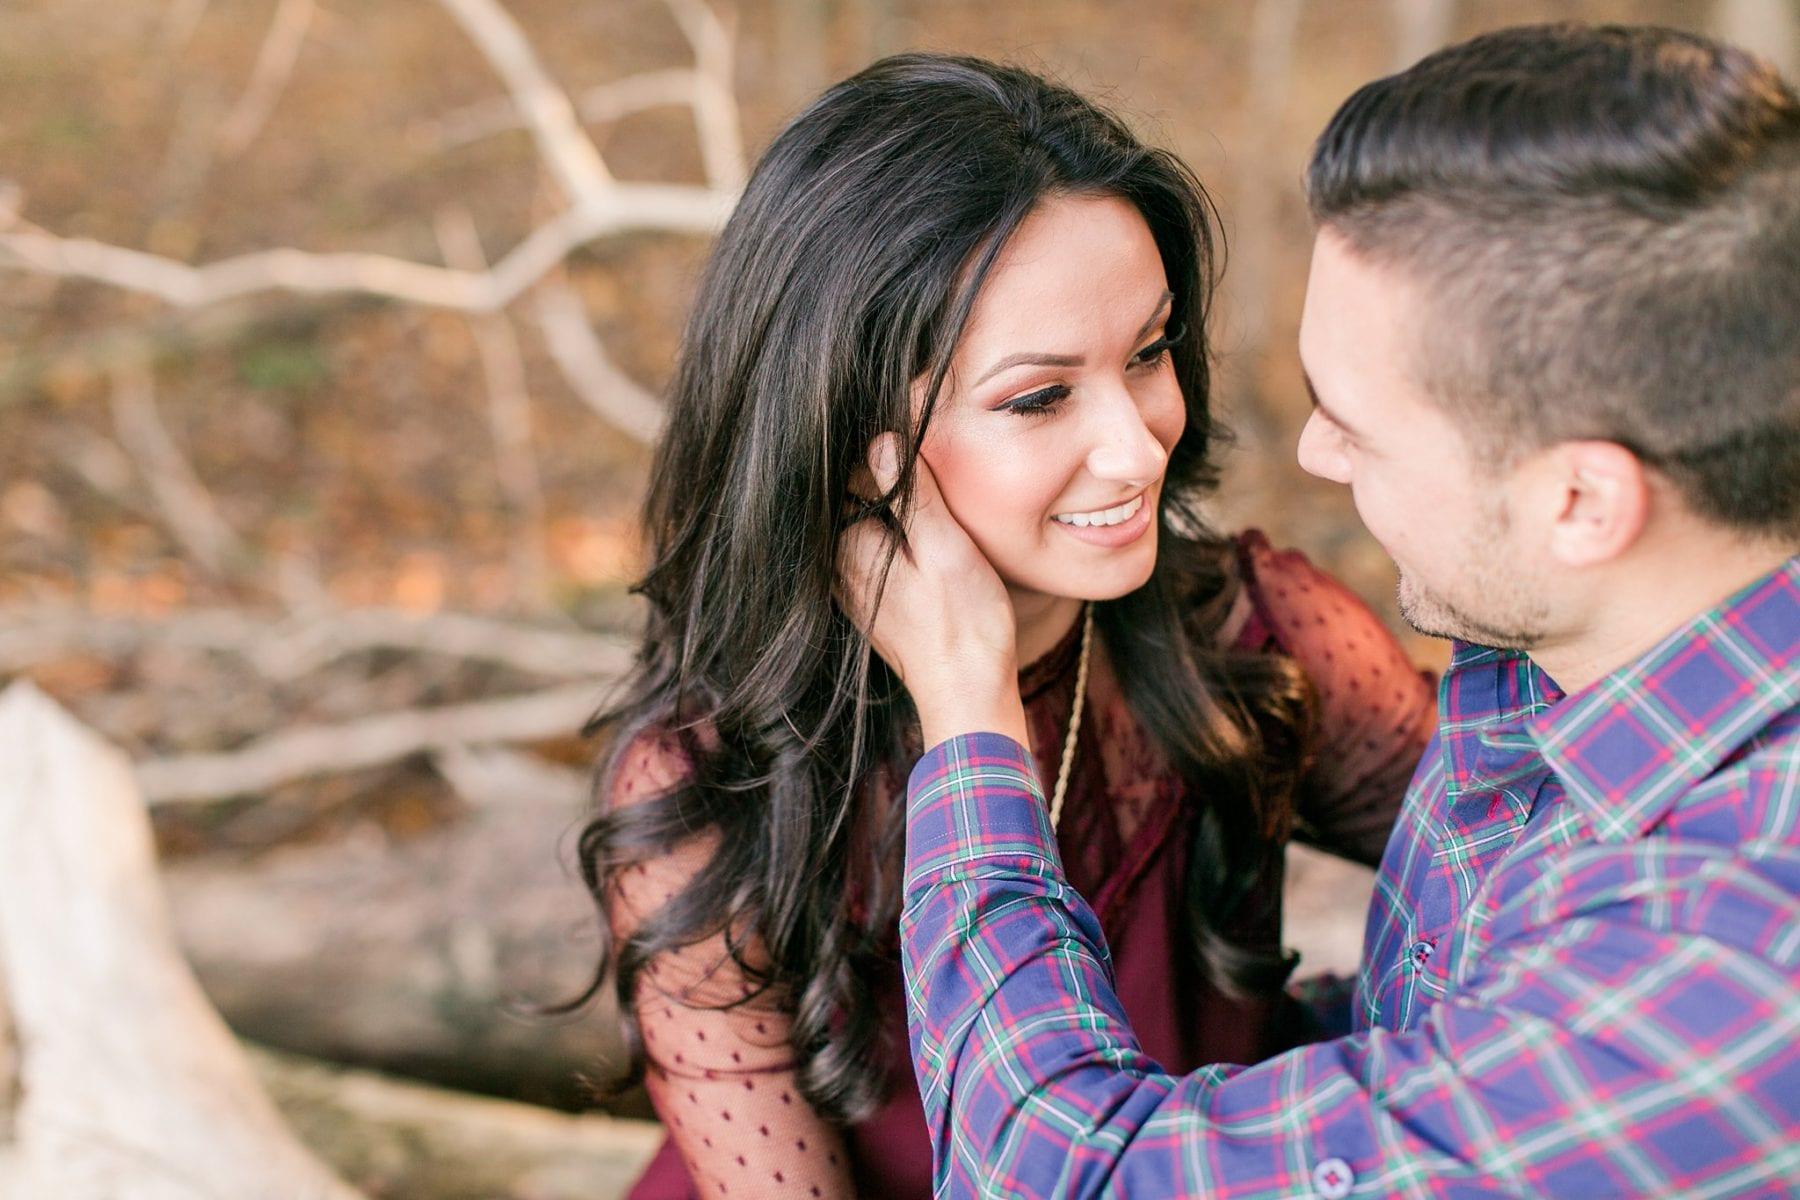 Manassas Battlefield Portraits Virginia Wedding Photographer Megan Kelsey Photography Lianne & Chris-36.jpg